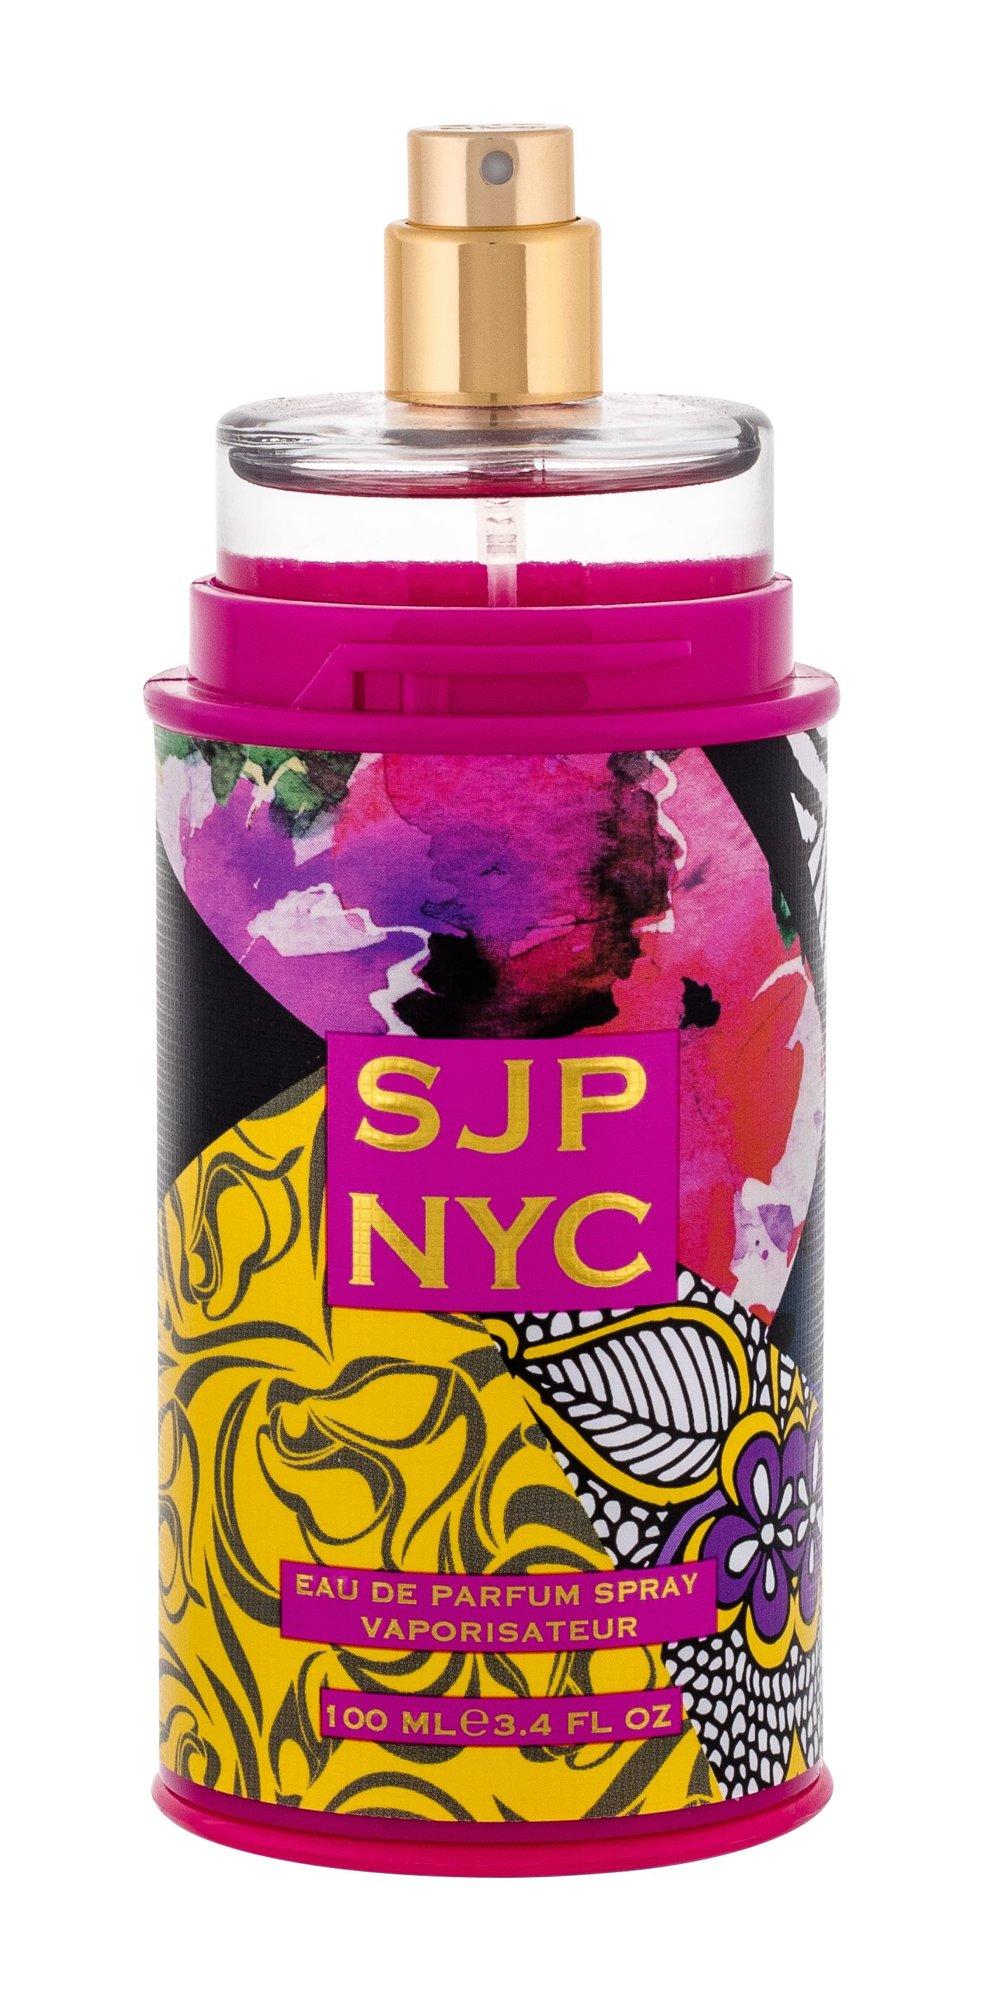 Sarah Jessica Parker SJP NYC Eau de Parfum 100ml